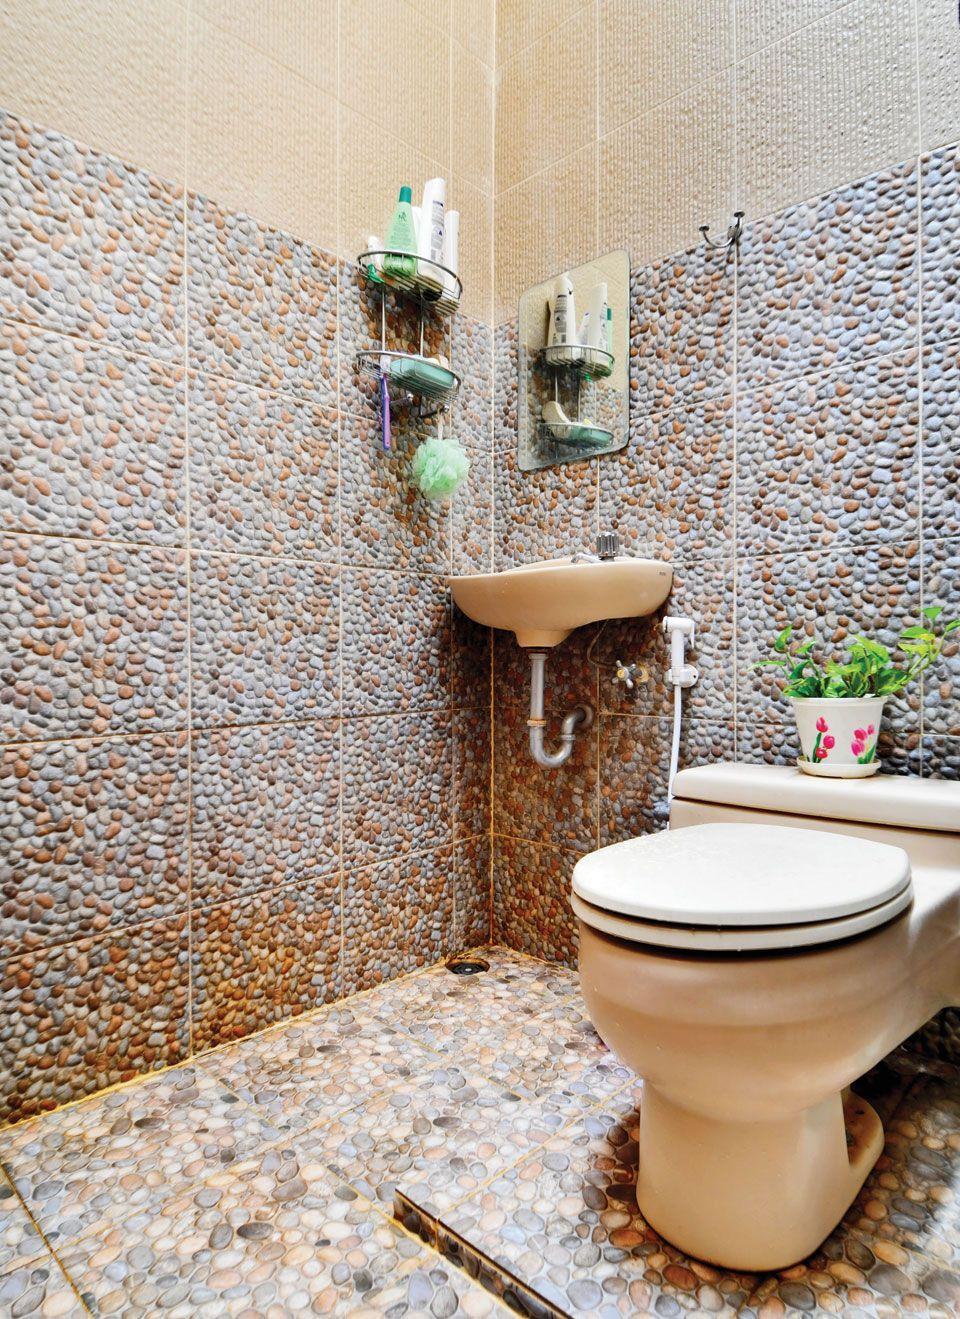 Model Kamar Mandi Minimalis Batu Alam Unik  Mandi, Kamar mandi